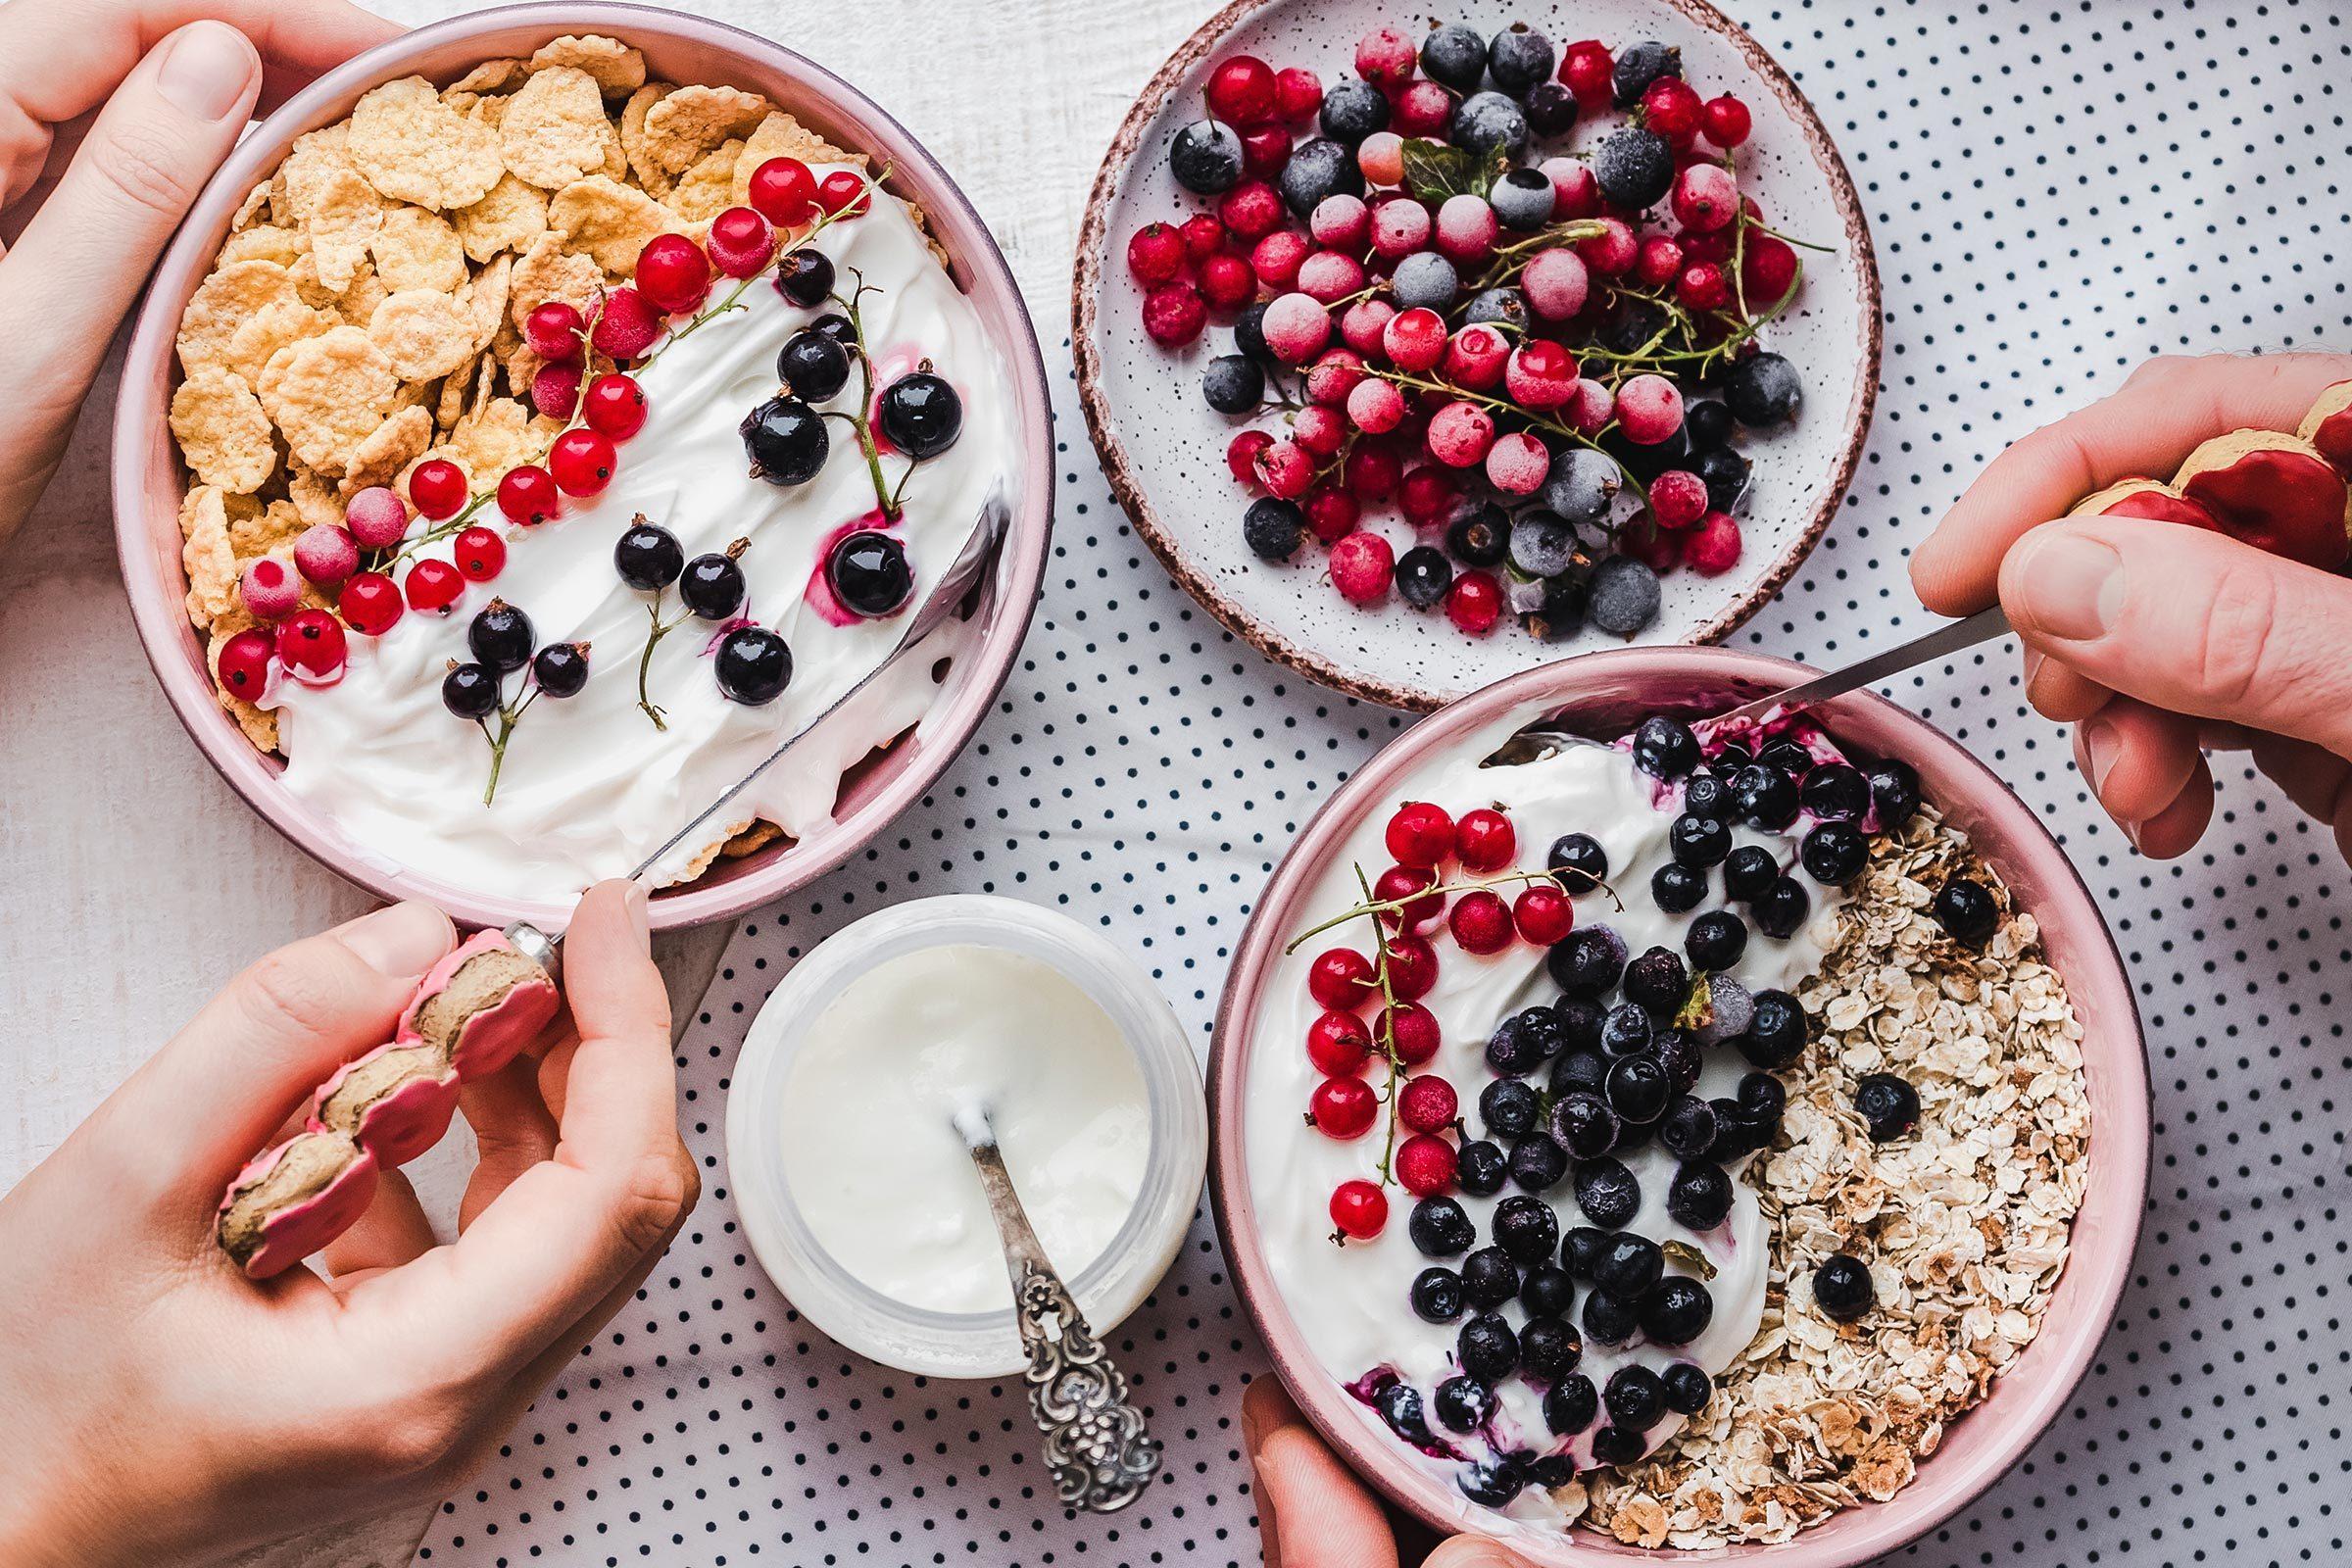 23 Foods That Help Lower High Blood Pressure